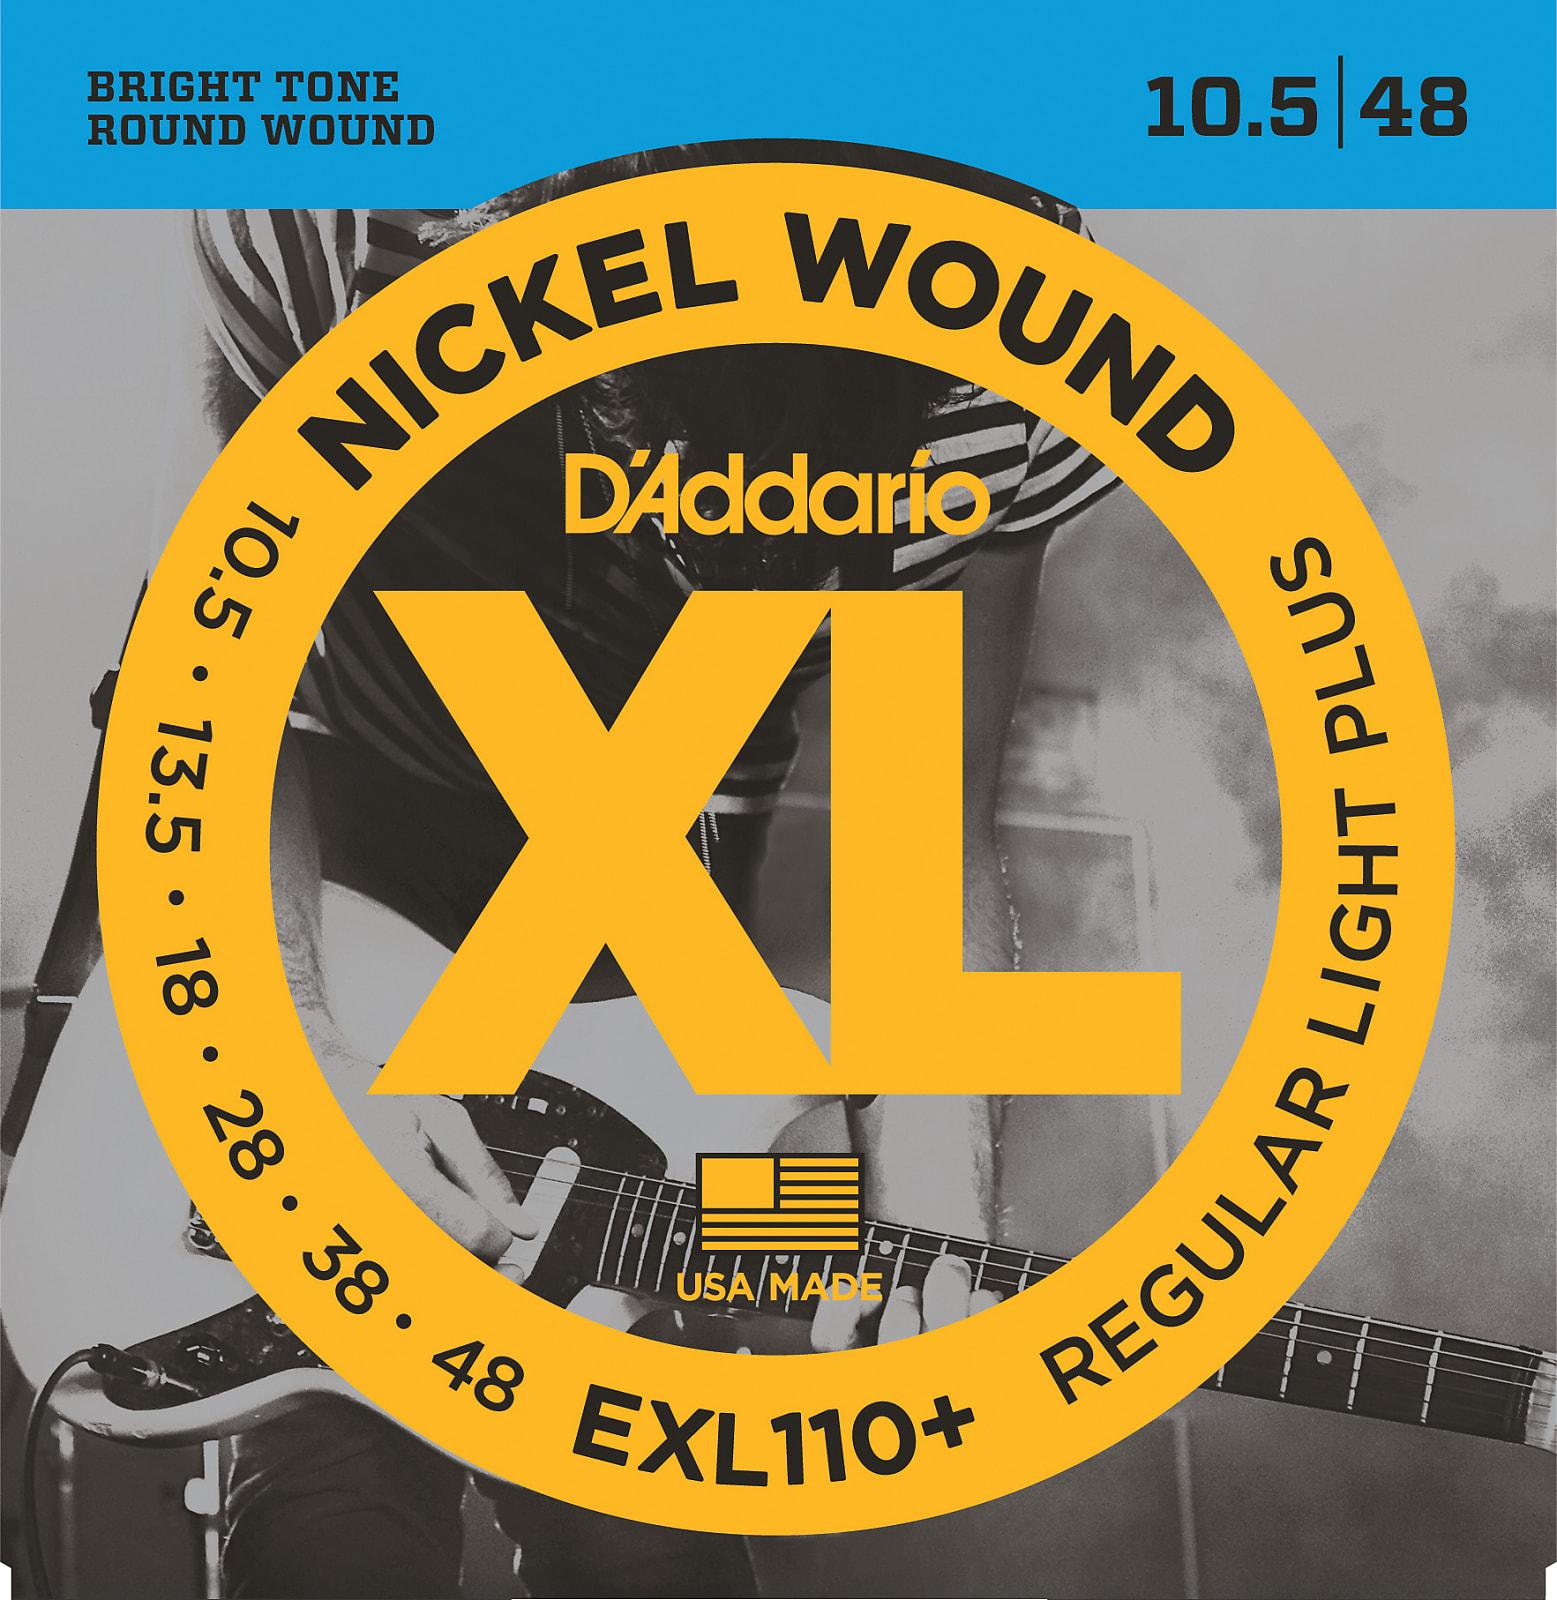 D'Addario EXL110+ Nickel Wound Electric Guitar Strings, Regular Light Plus, 10.